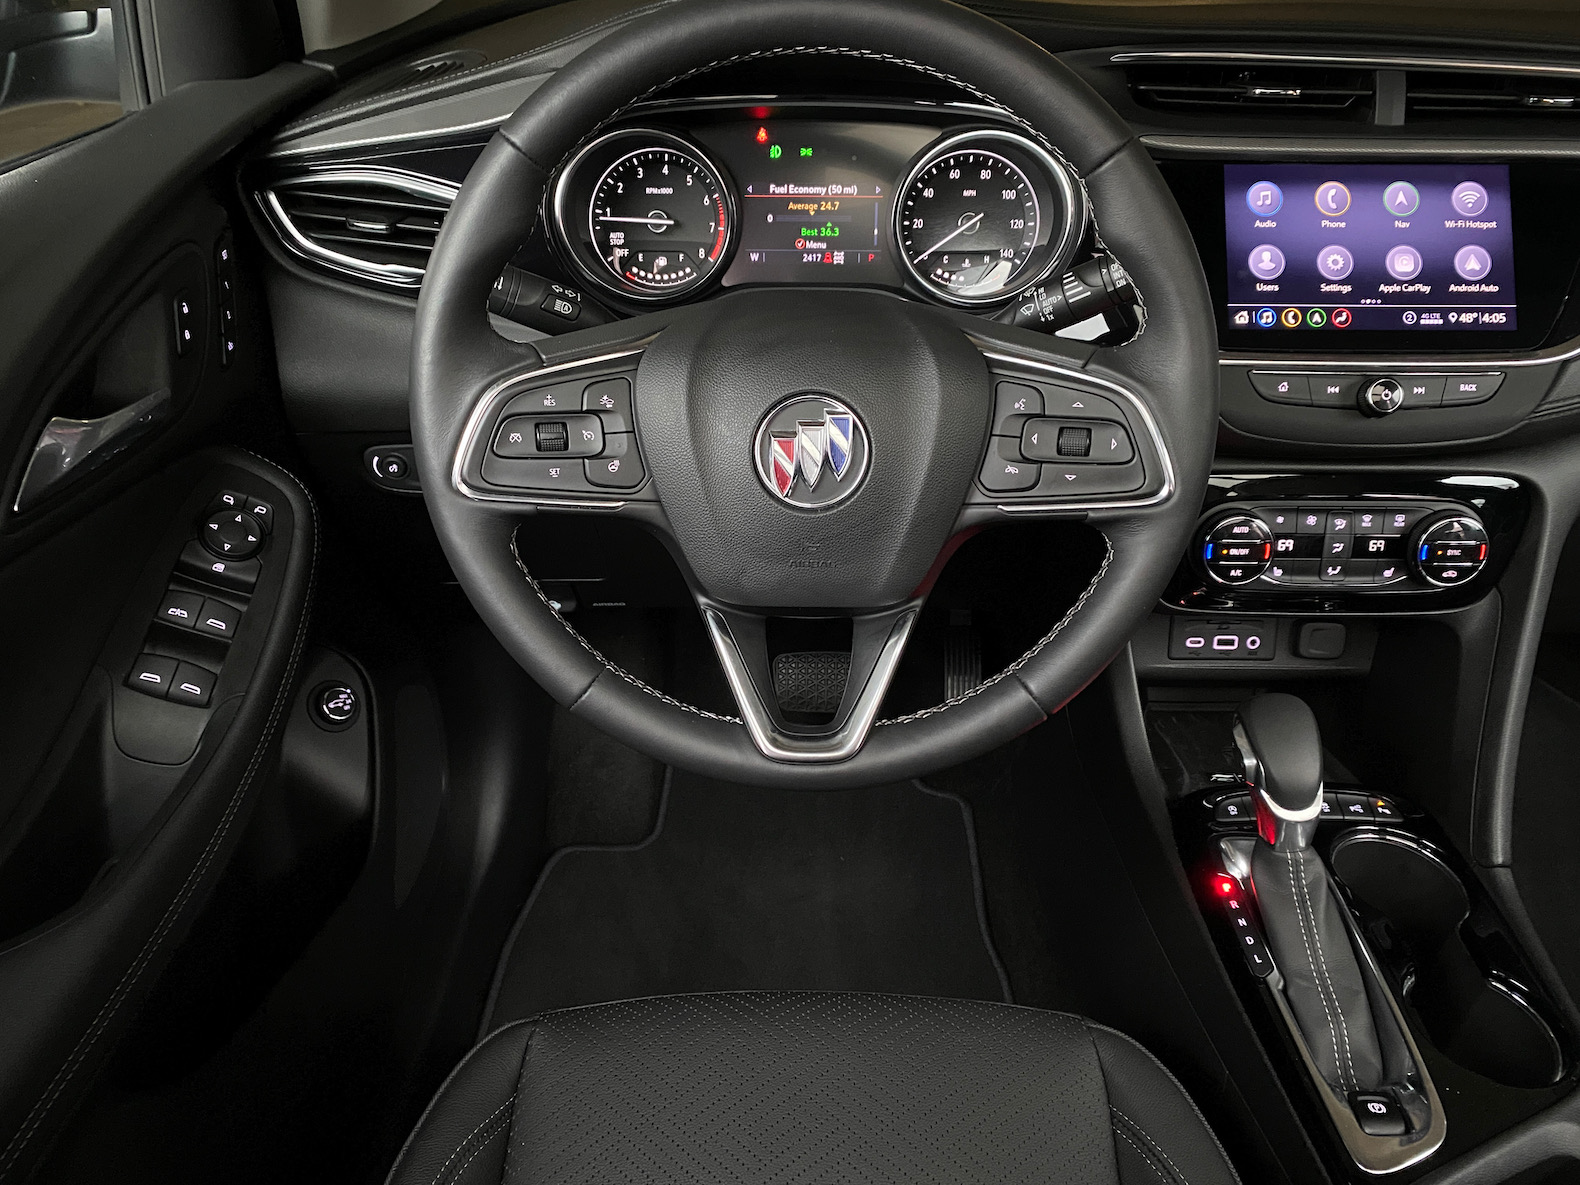 2020 Buick Encore GX Review